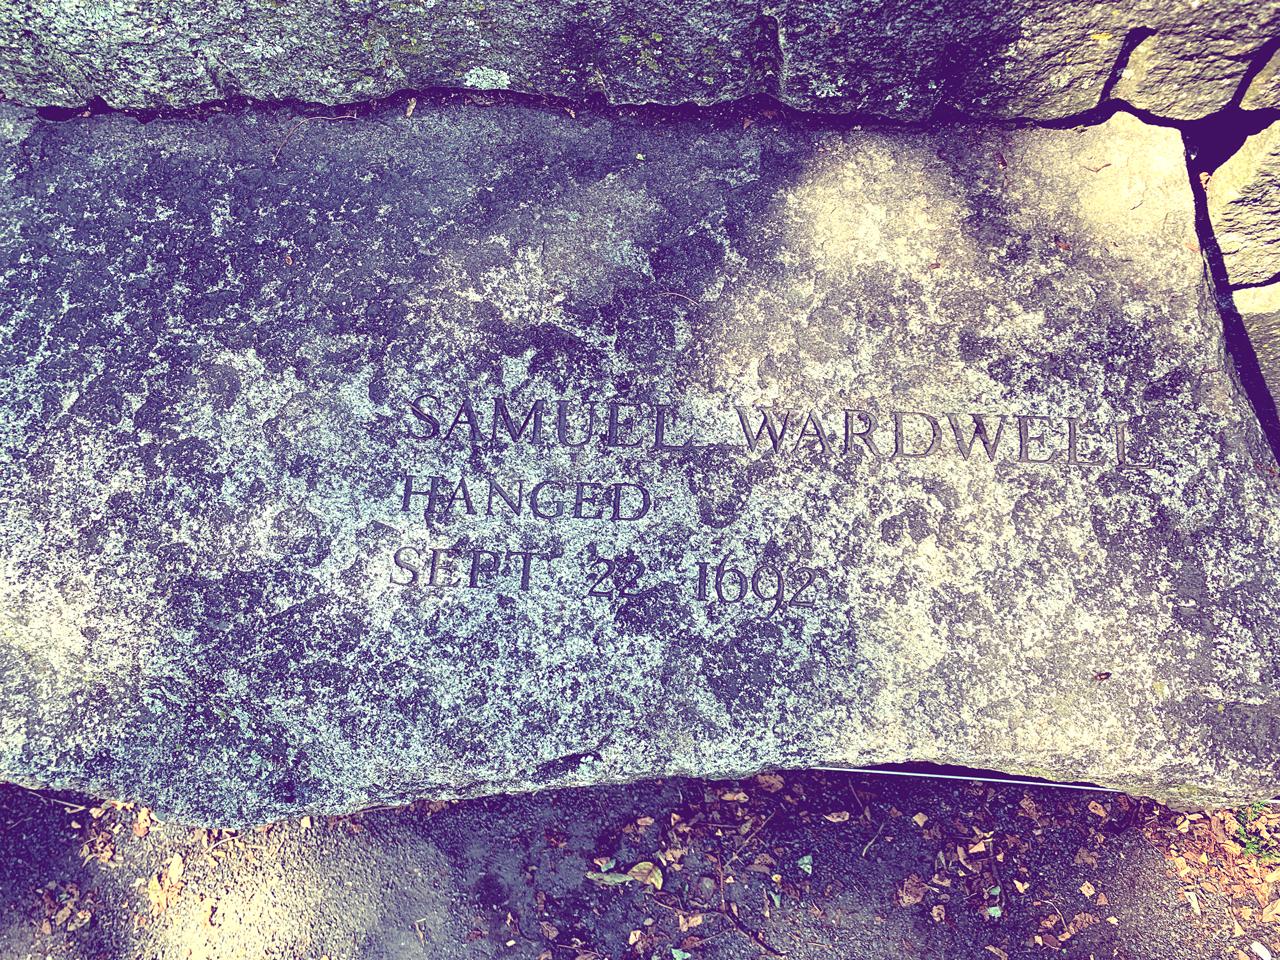 salem-witch-trials-memorial-massachusetts-samuel-wardwell-1280x960